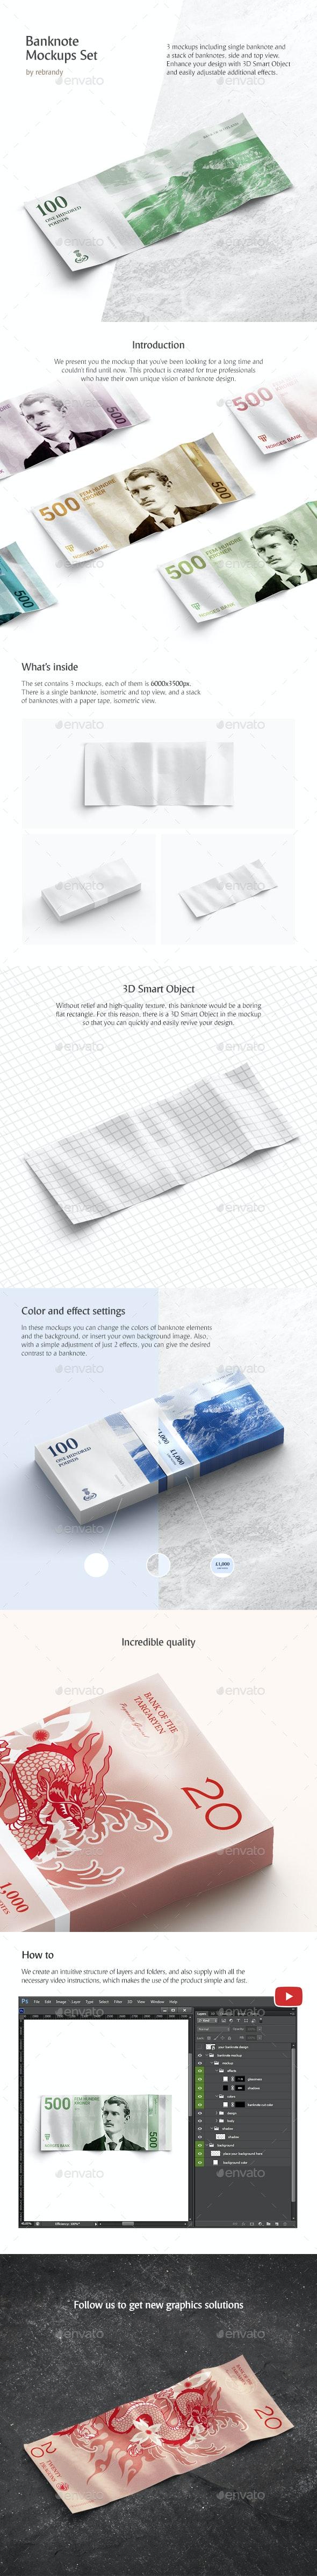 Banknote Mockups Set - Product Mock-Ups Graphics